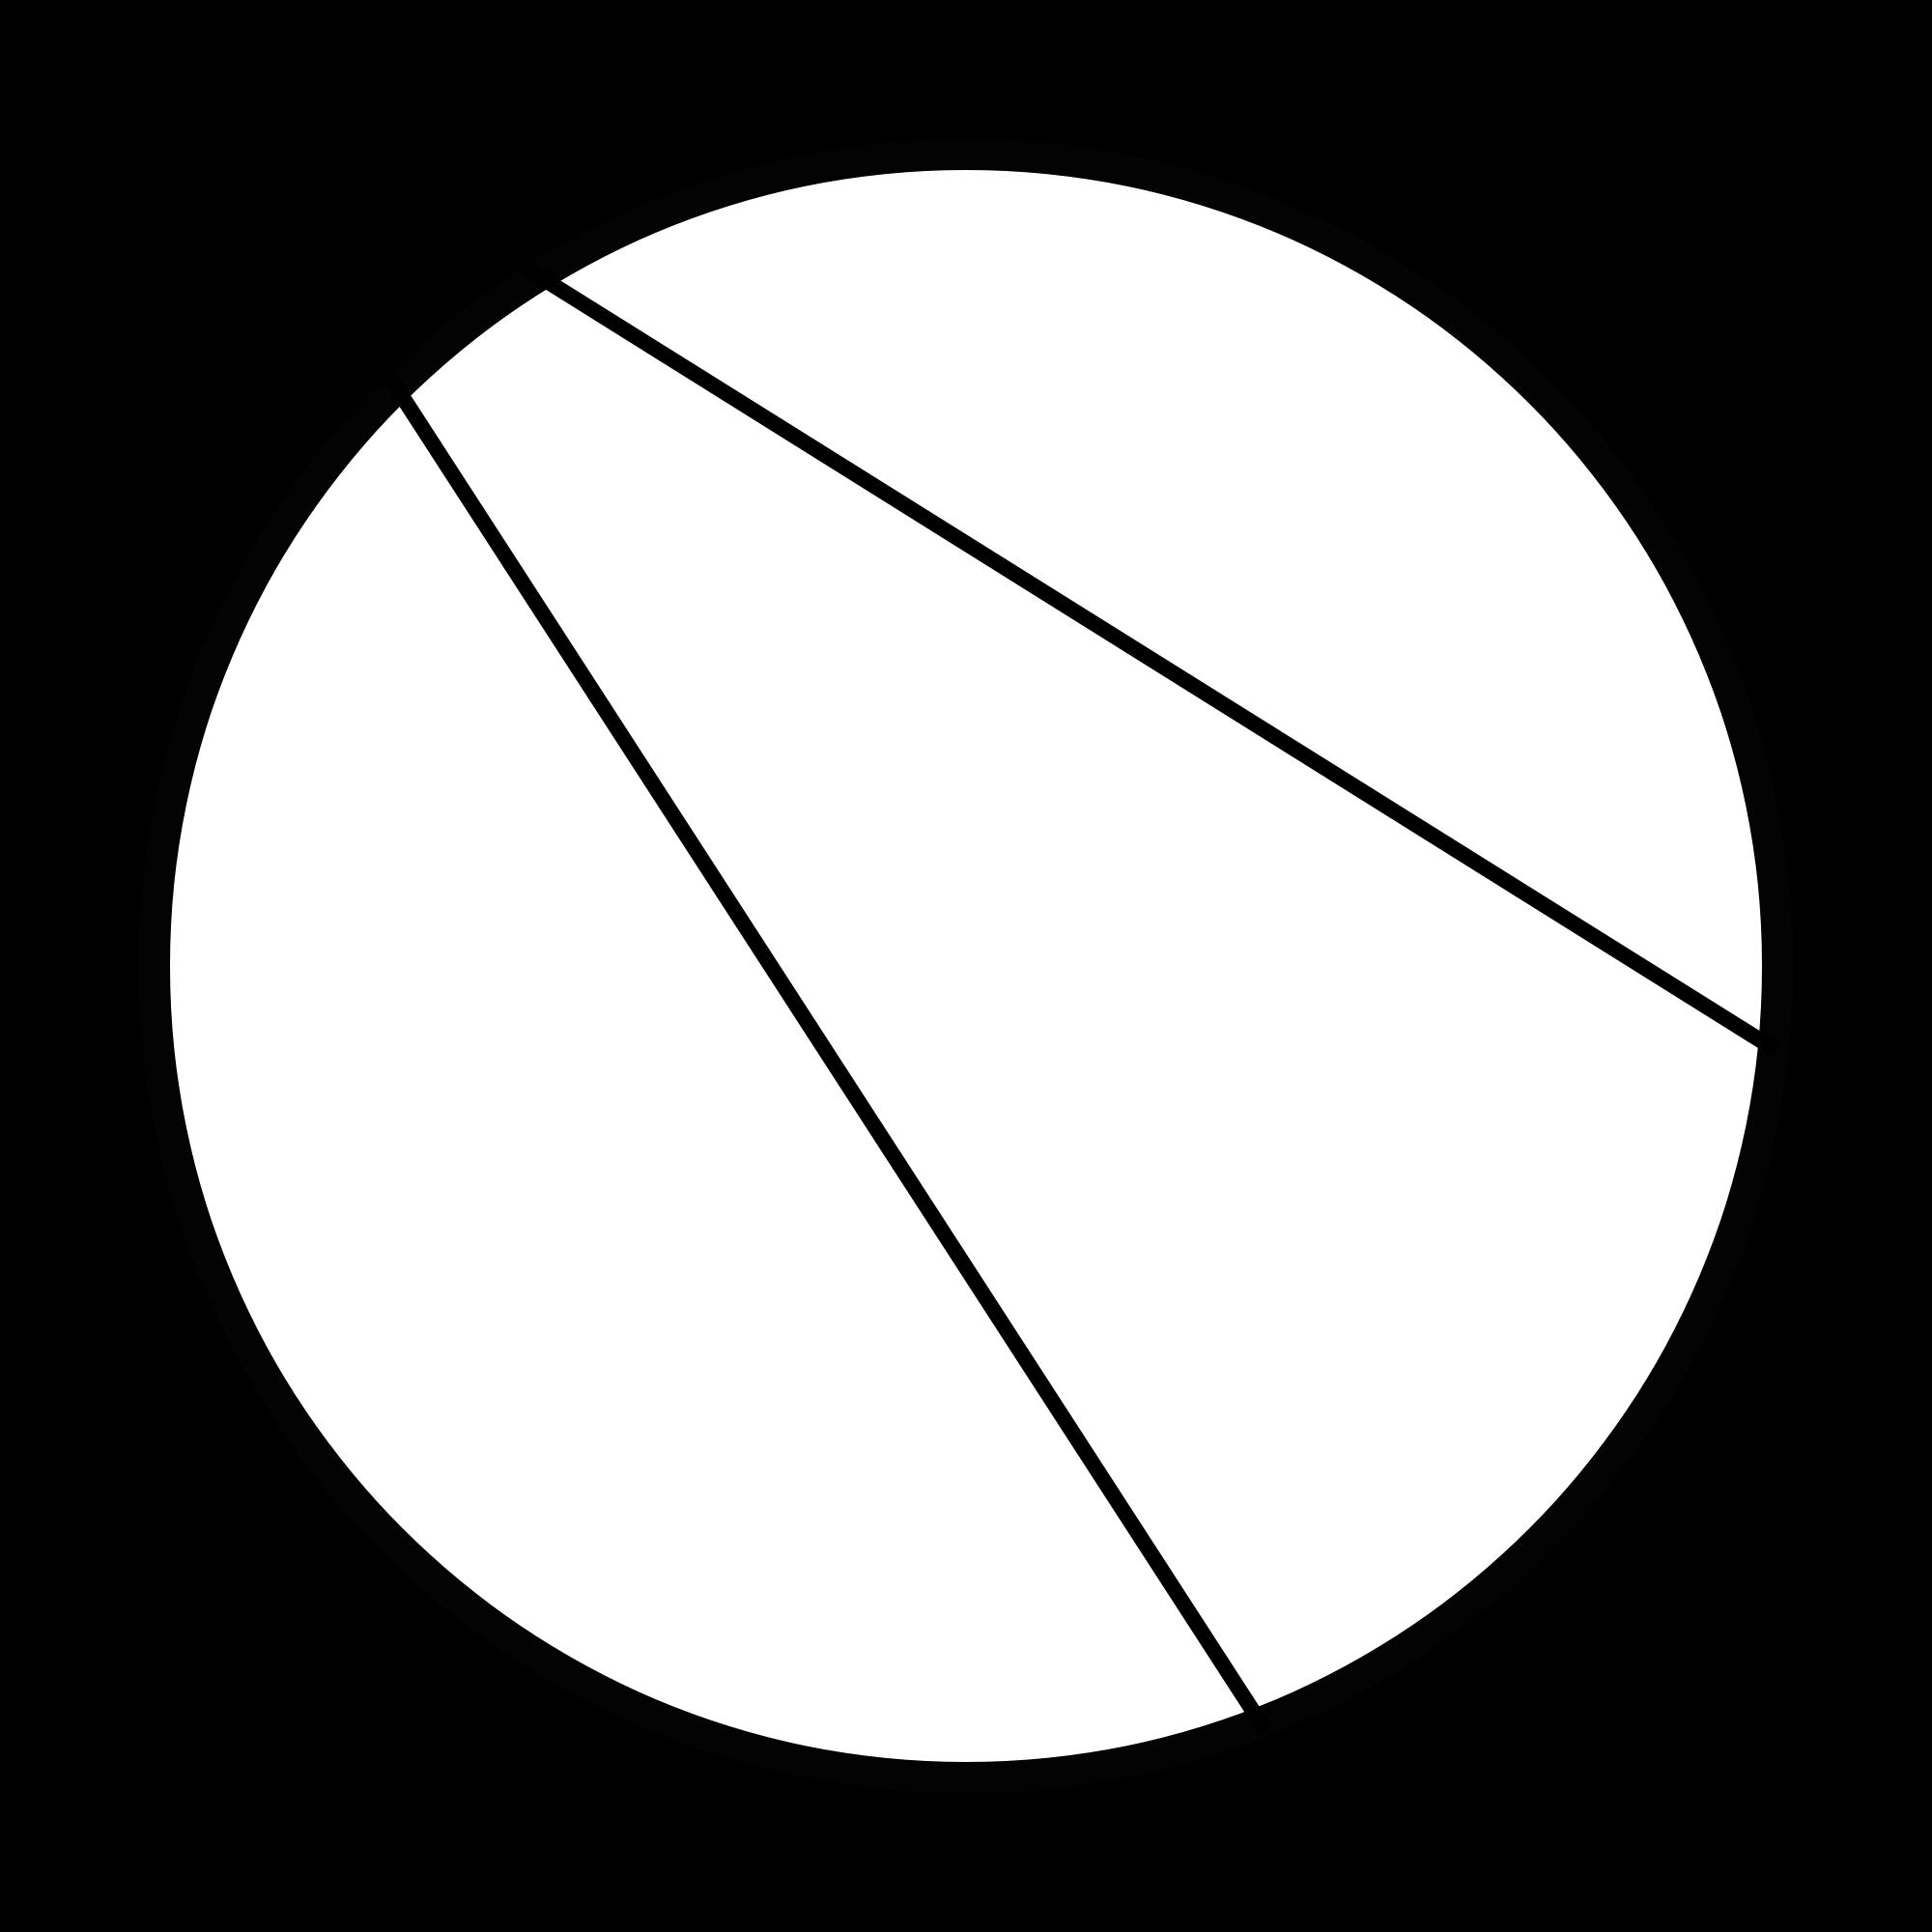 venn diagram 5 circles pic wiring